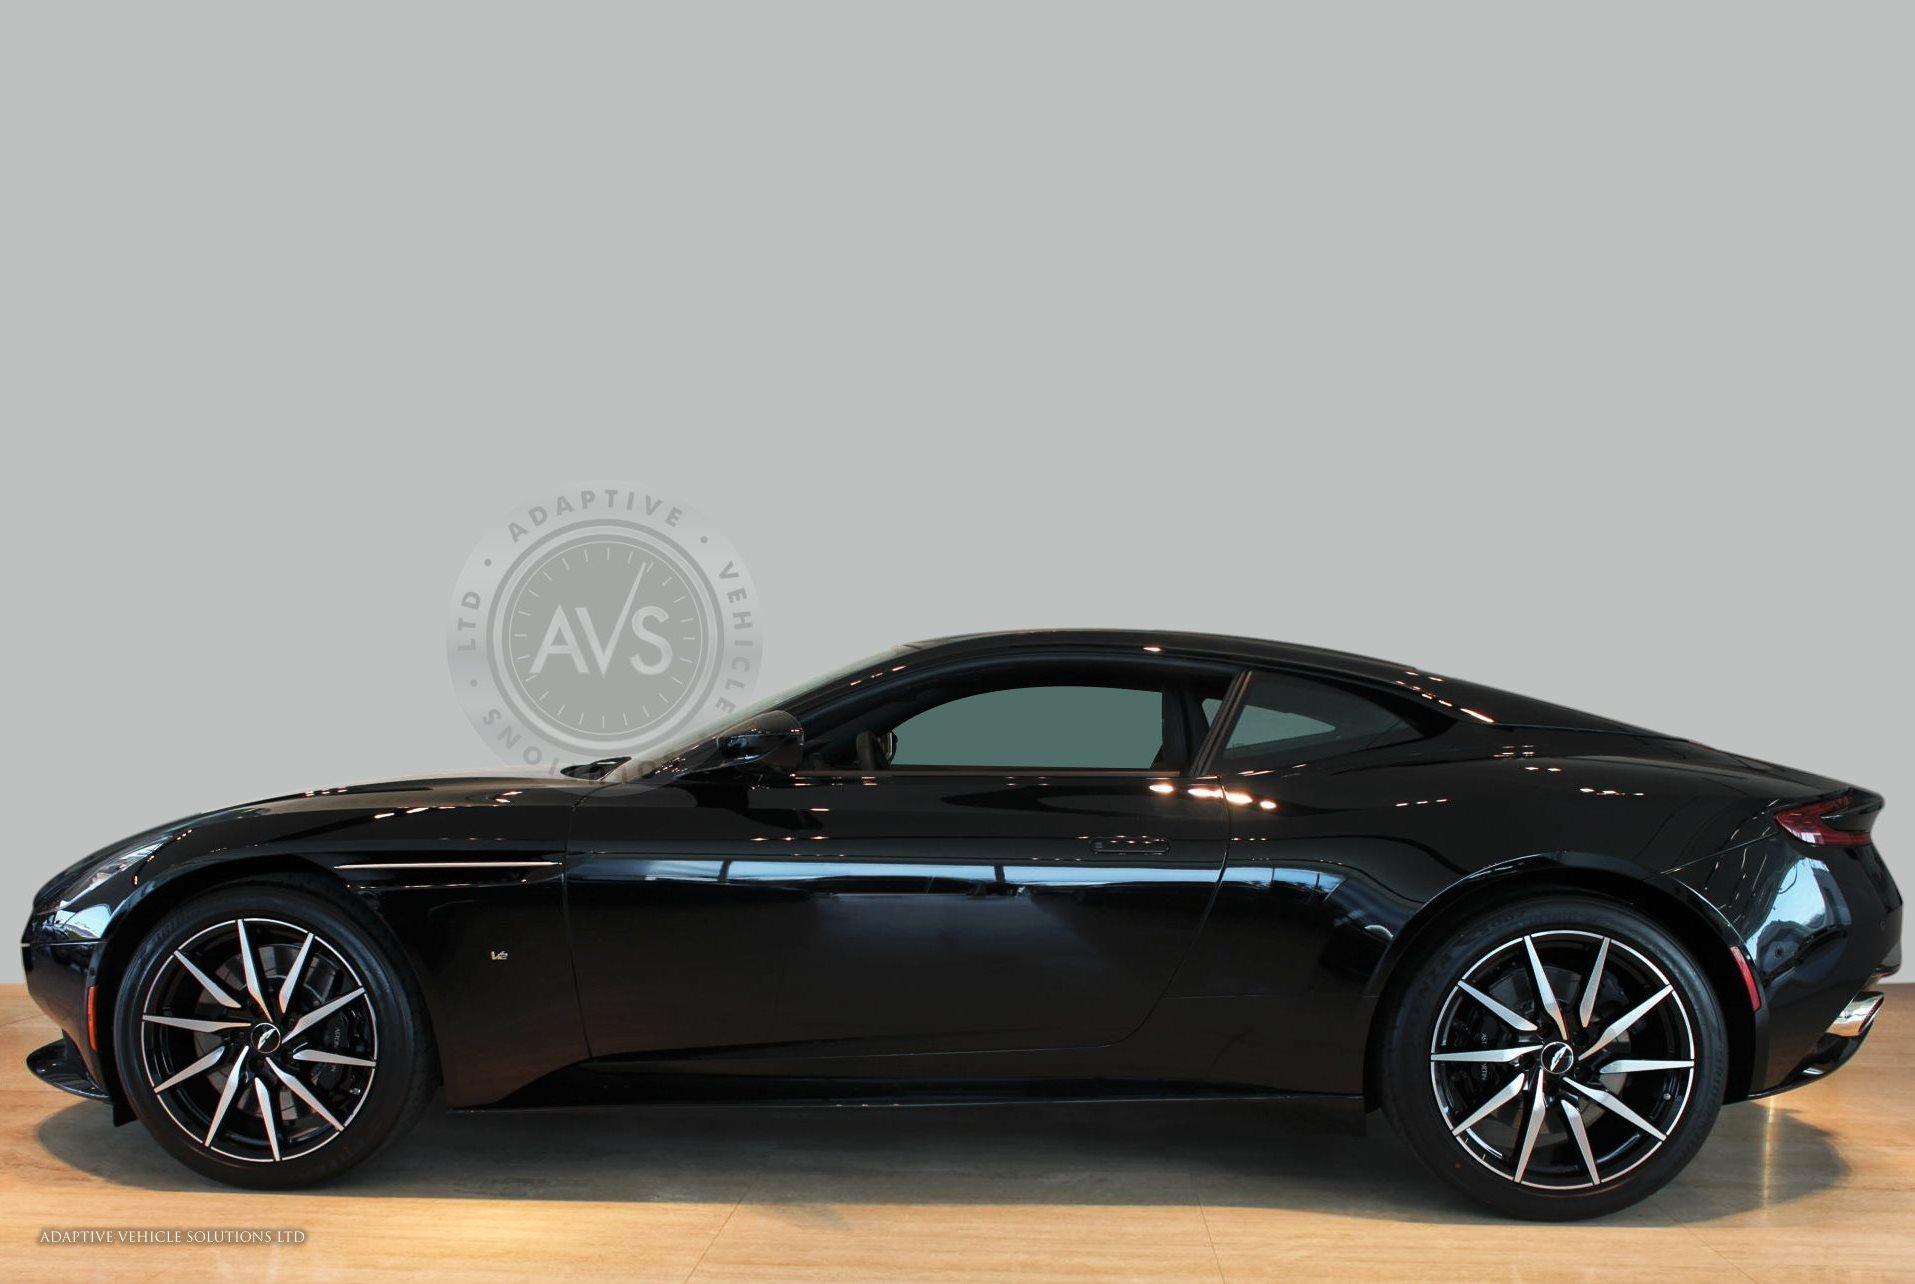 2018 Aston Martin Db11 2 Adaptive Vehicle Solutions Ltd